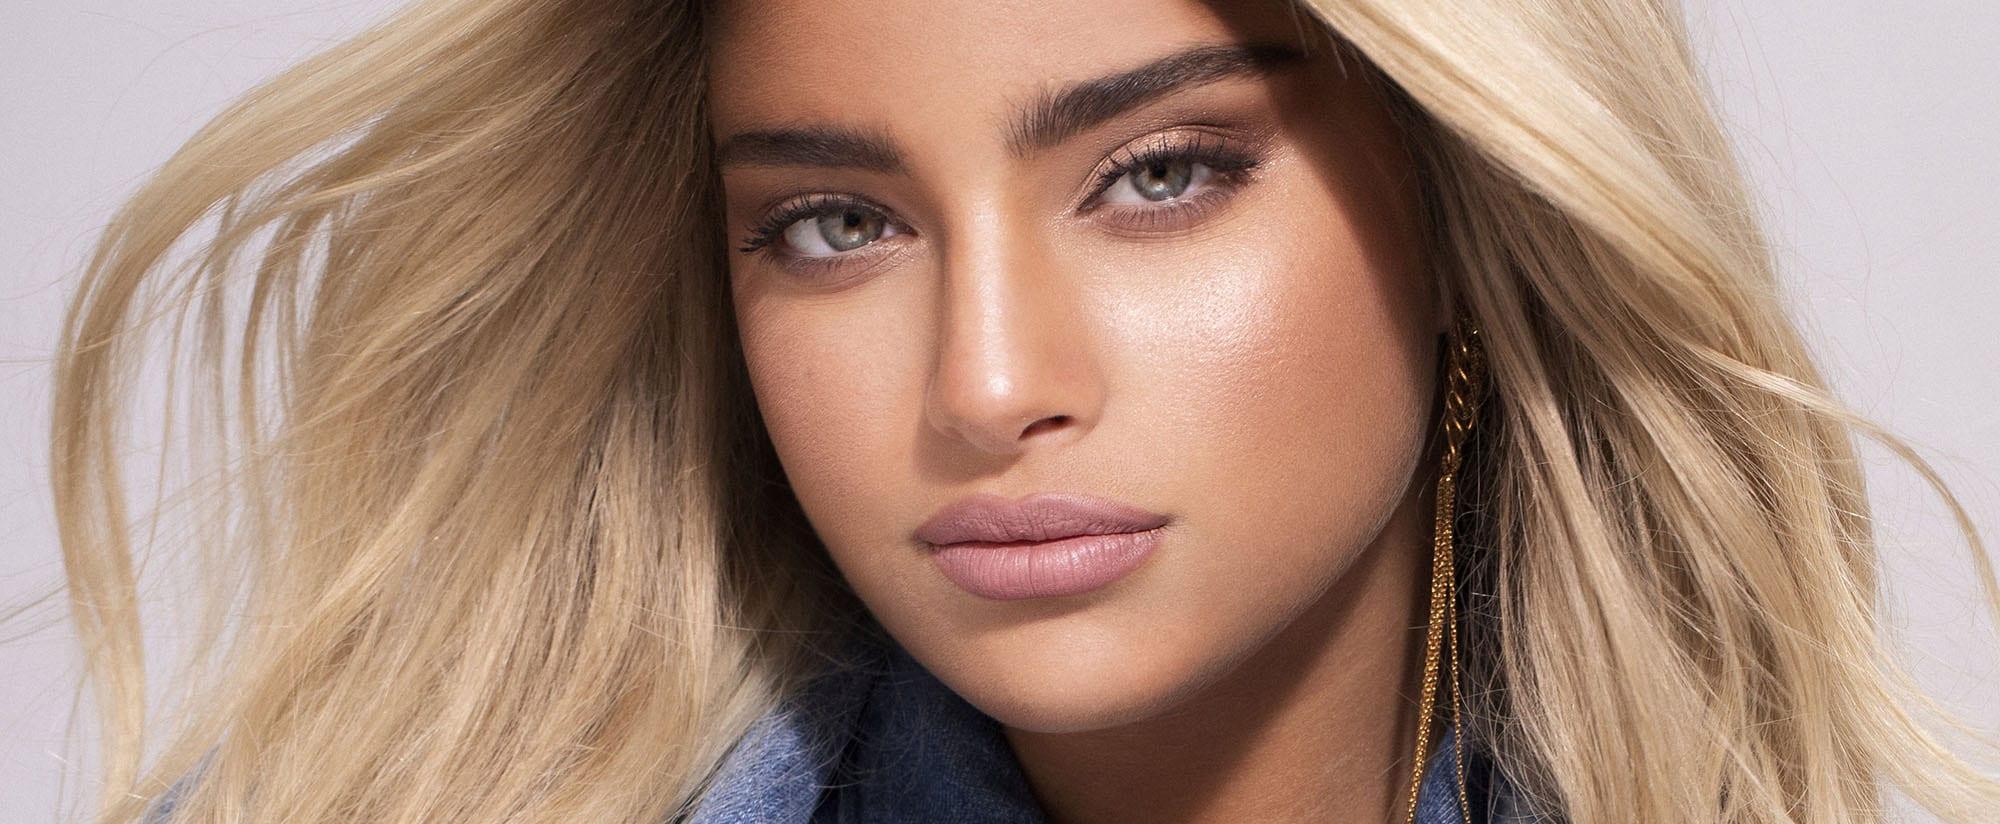 Fashion Israel, נועה קירל, איפור, אופנה, לסדרת האיפור של מאק צילום - איילת ארד